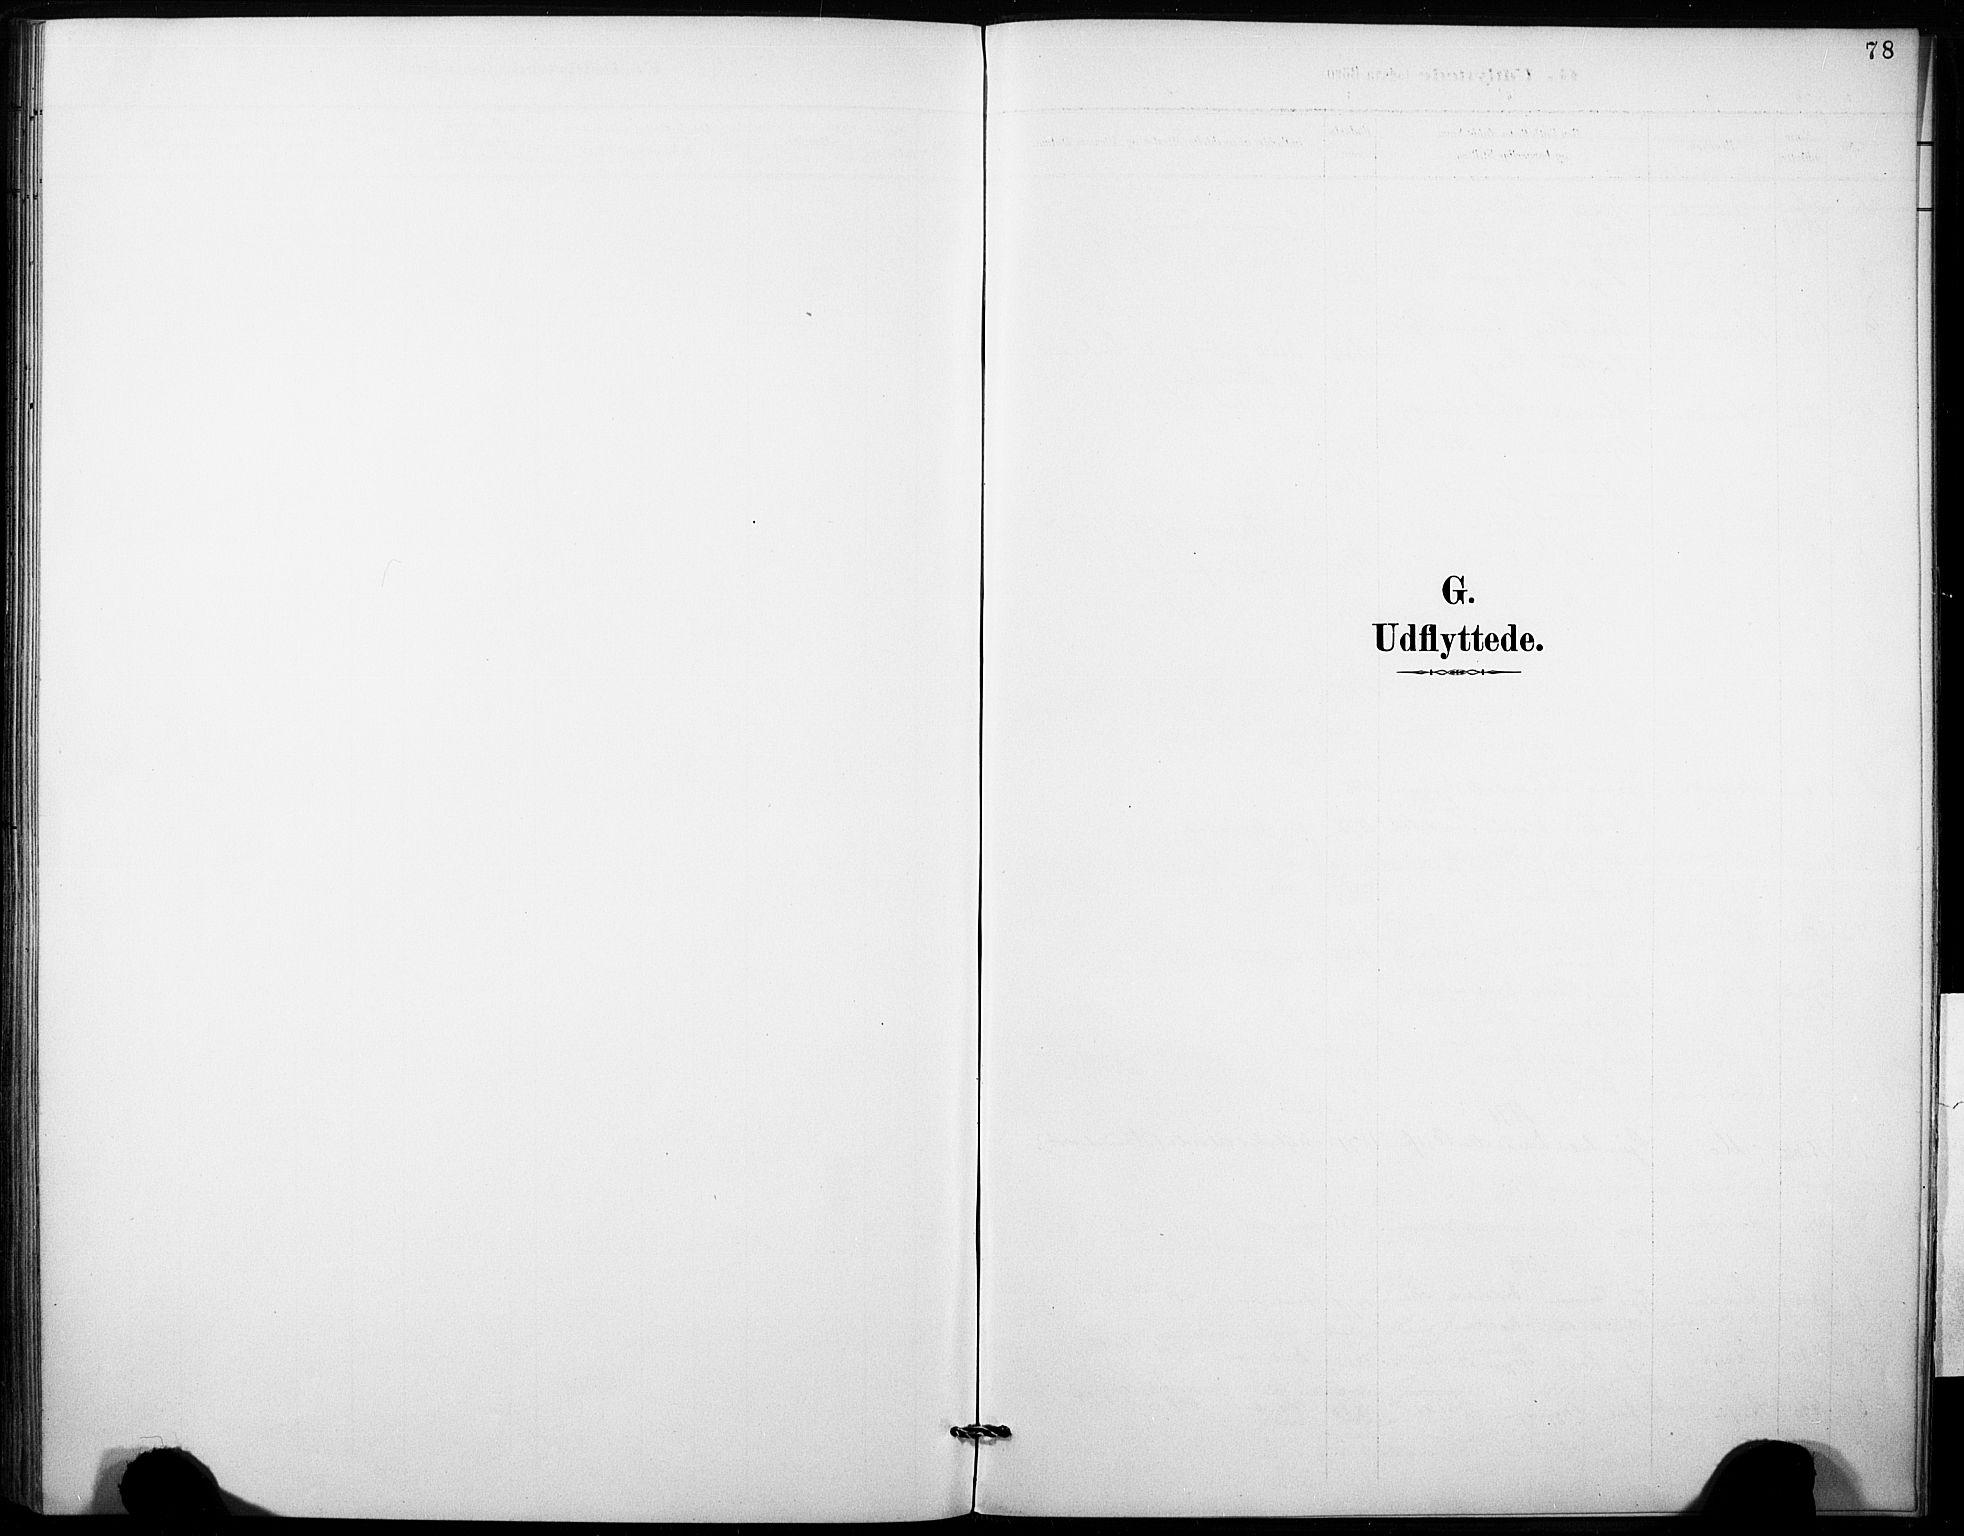 SAKO, Fyresdal kirkebøker, F/Fb/L0003: Ministerialbok nr. II 3, 1887-1903, s. 78